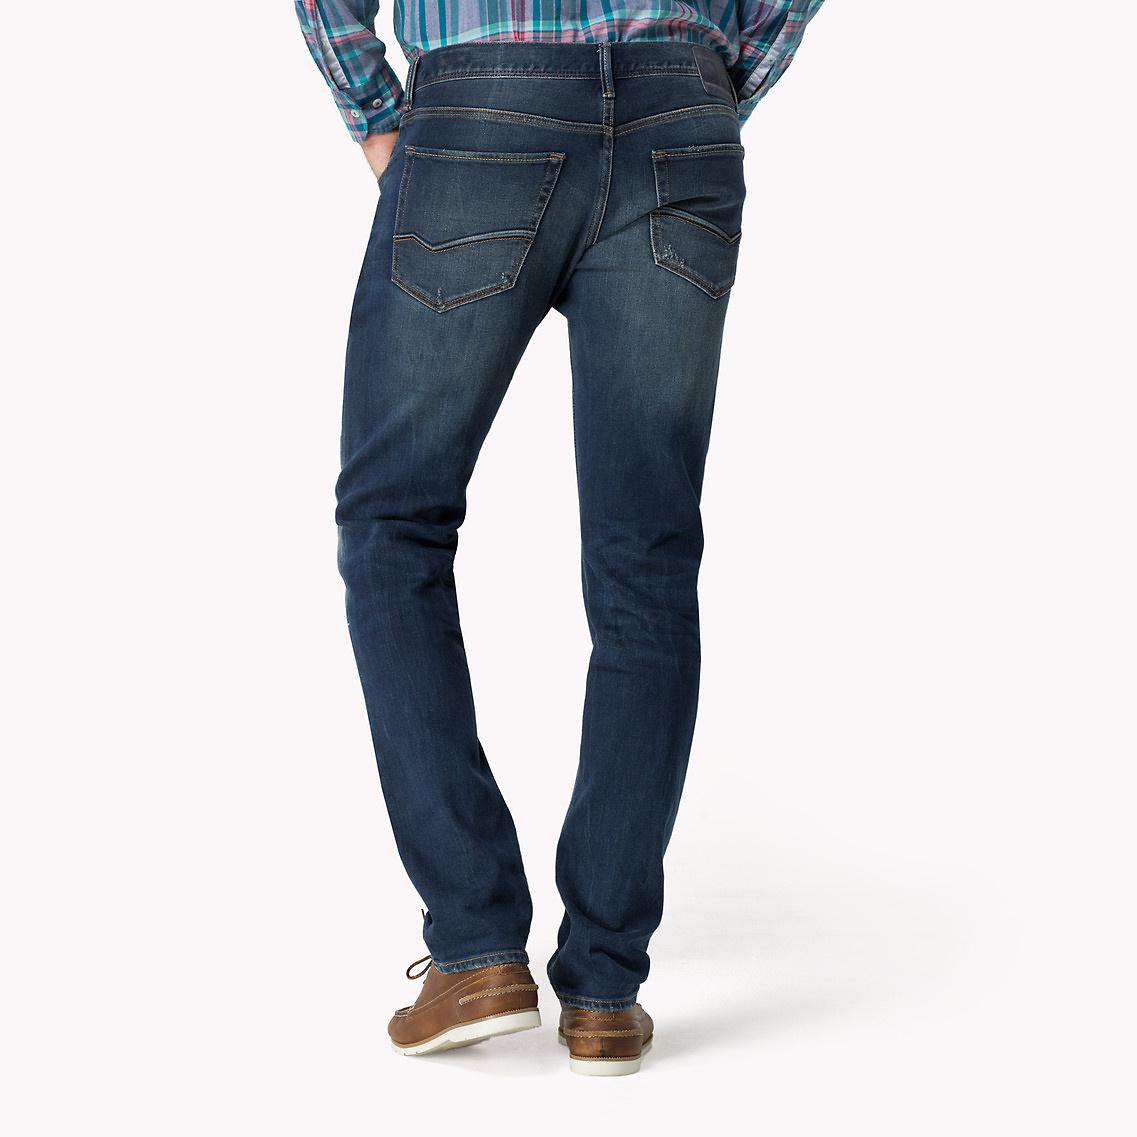 19f062569 Tommy Hilfiger Slim Fit Jeans in Blue for Men - Lyst